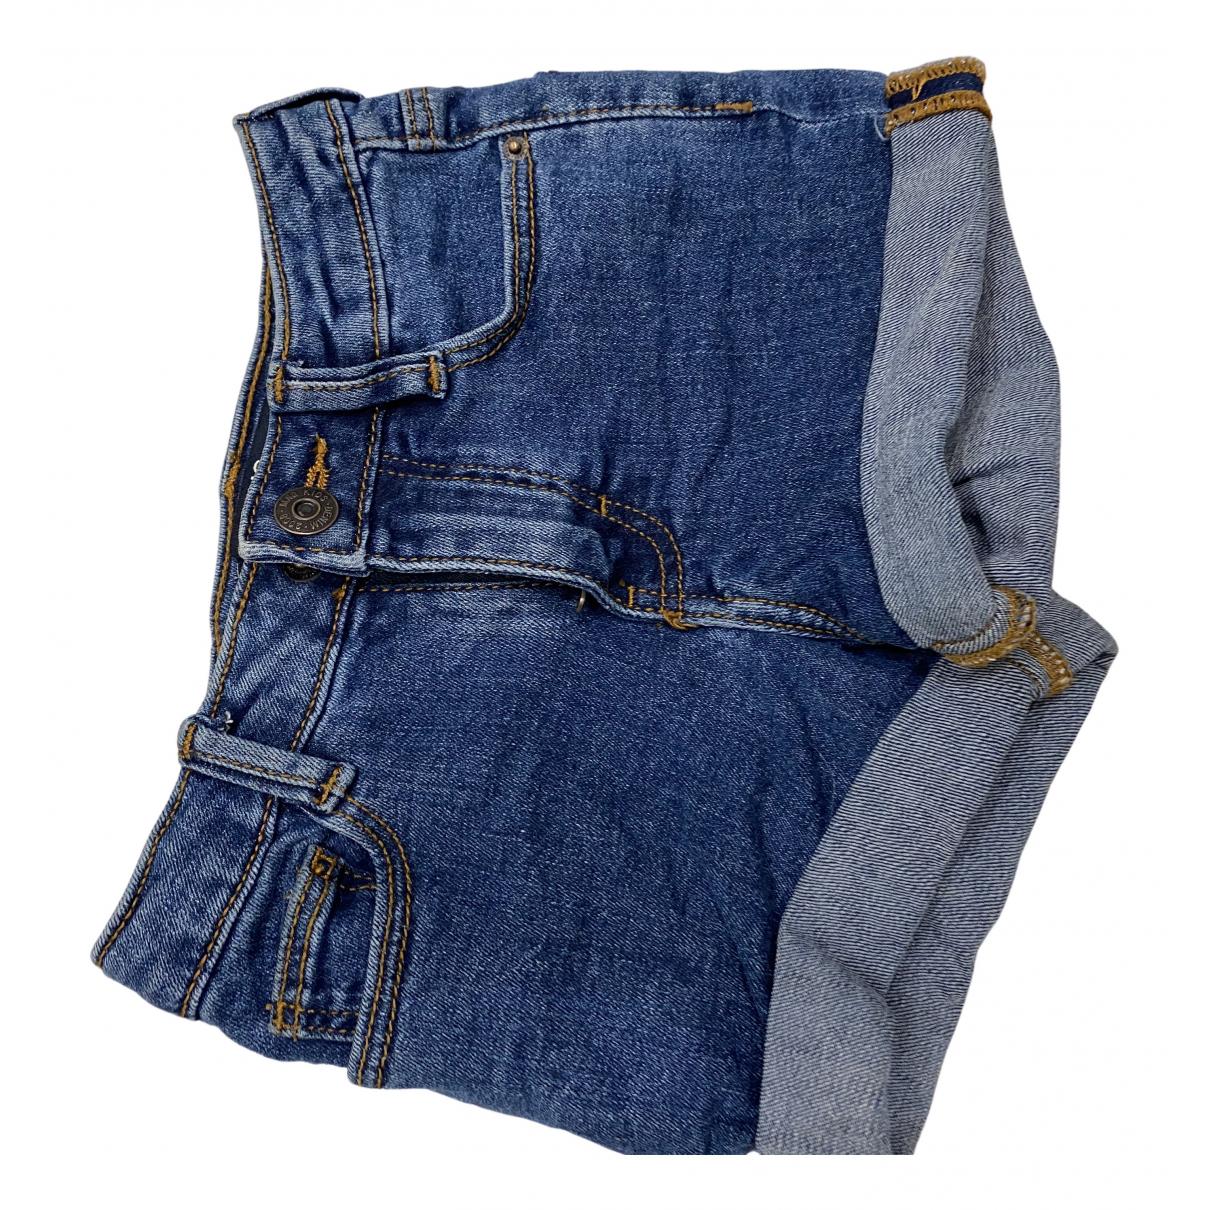 Mango \N Shorts in  Blau Denim - Jeans